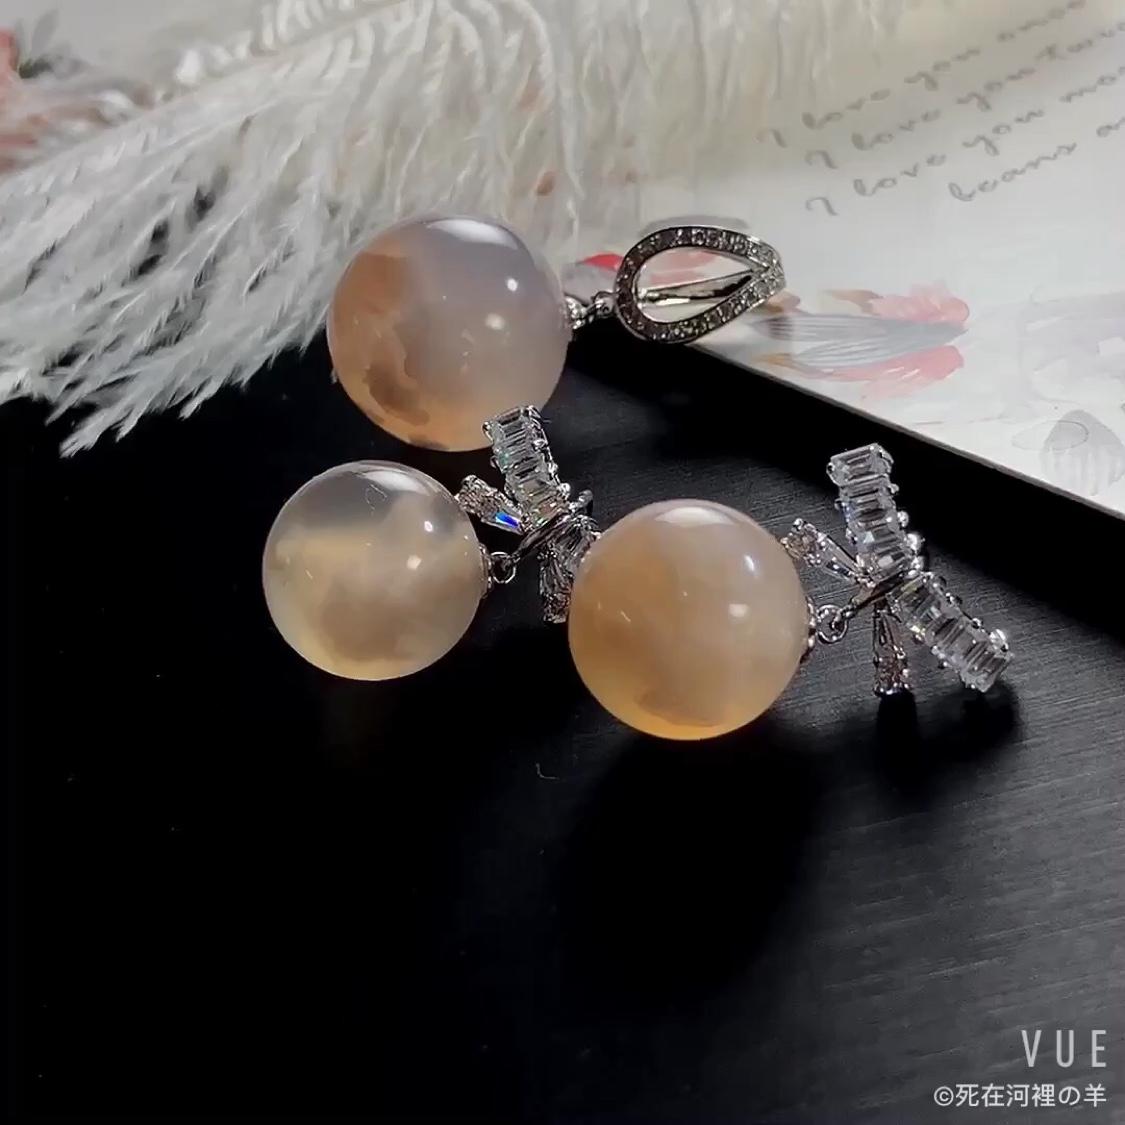 Baa hand made natural cherry agate bowknot Zircon Earrings Earrings Christmas gift Pendant Set